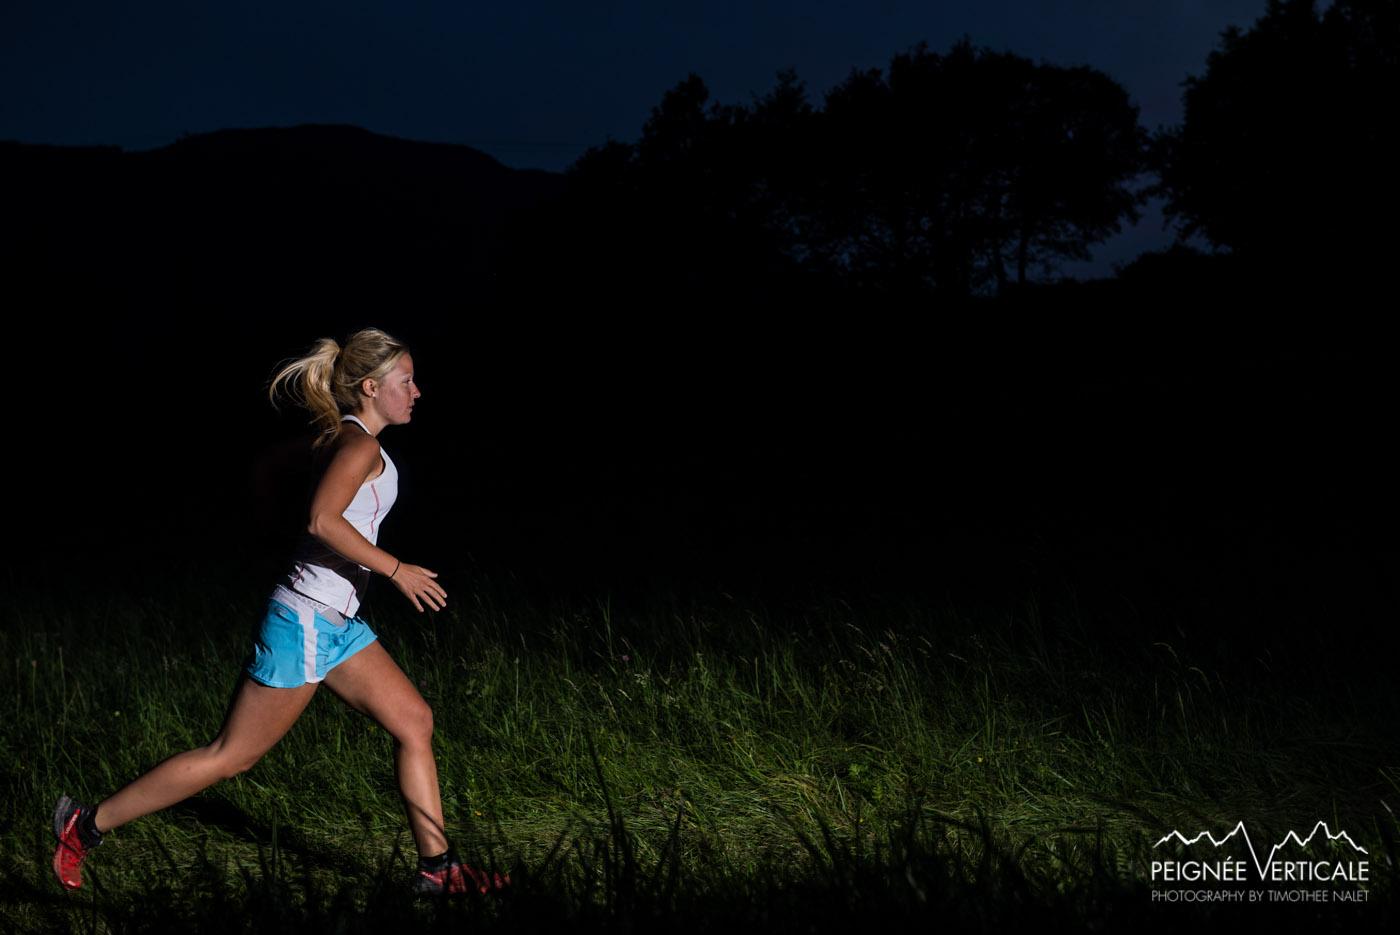 Timothee-Nalet-Laurie-Renoton-Running-night-5654.jpg